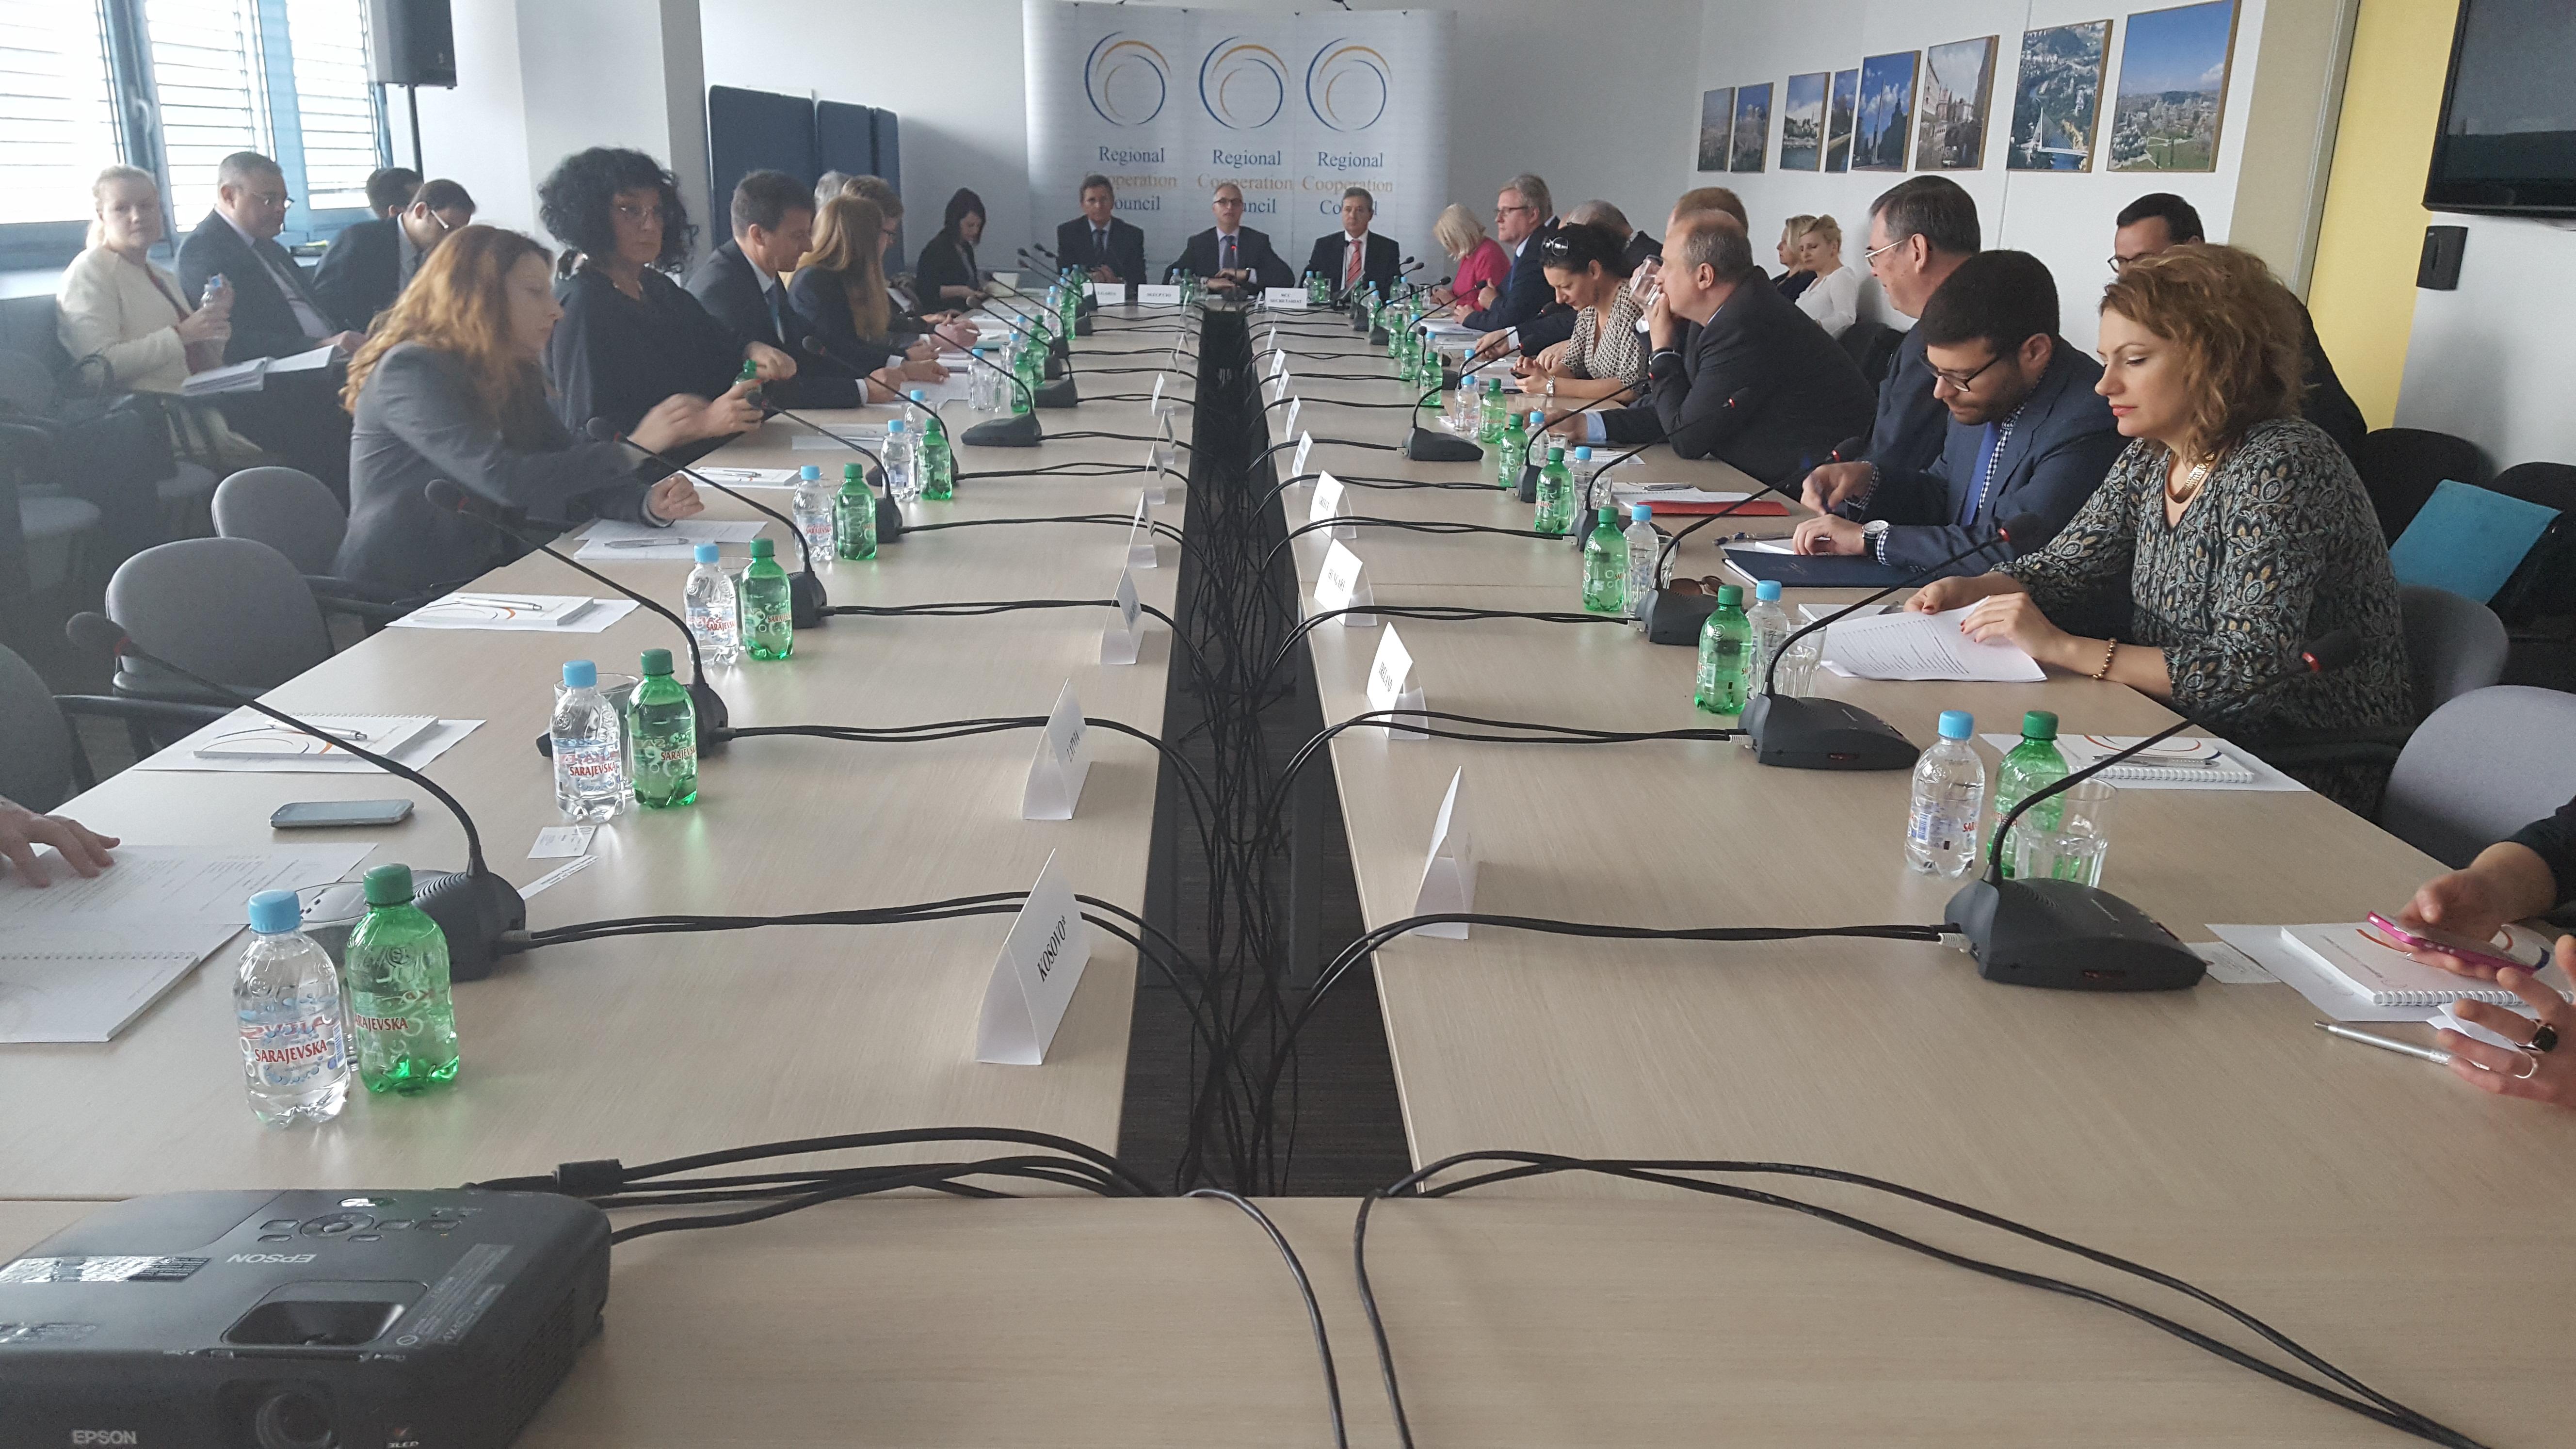 Meeting of the RCC Board, held in Sarajevo on 11 May 2016. (Photo: RCC/Selma Ahatovic-Lihic)